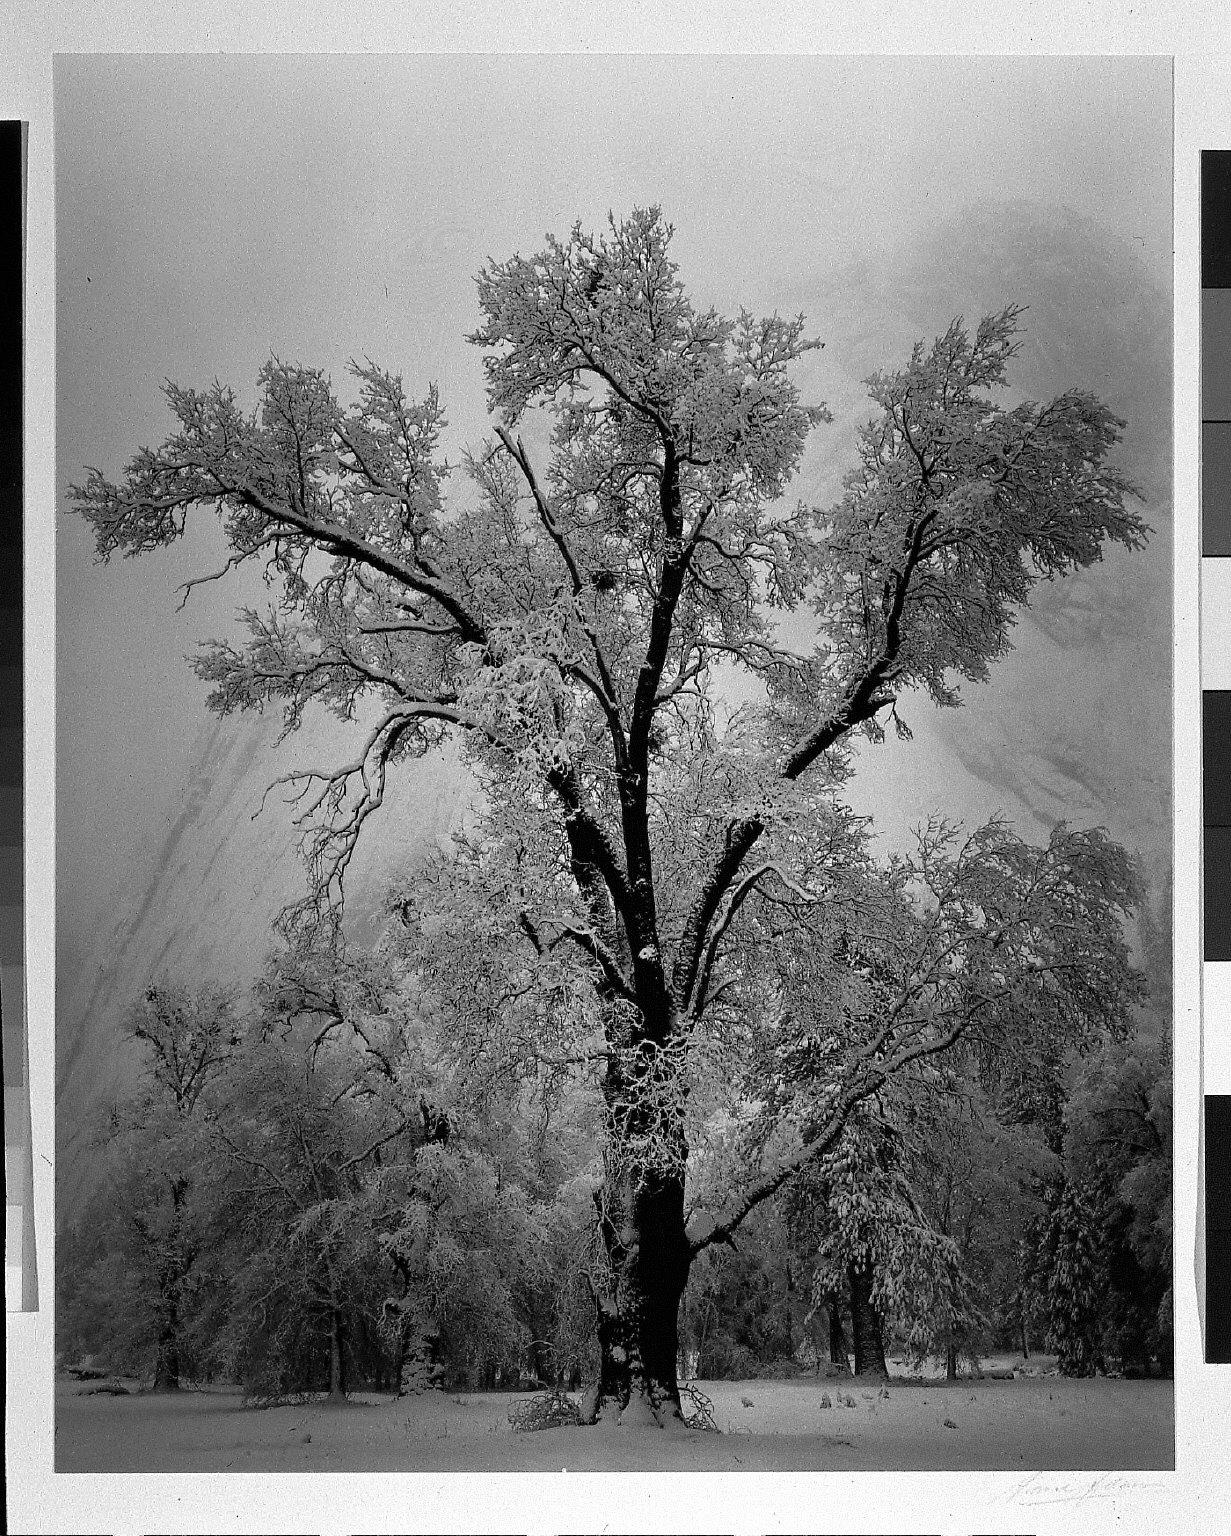 Oak Tree, Snow Storm, Yosemite